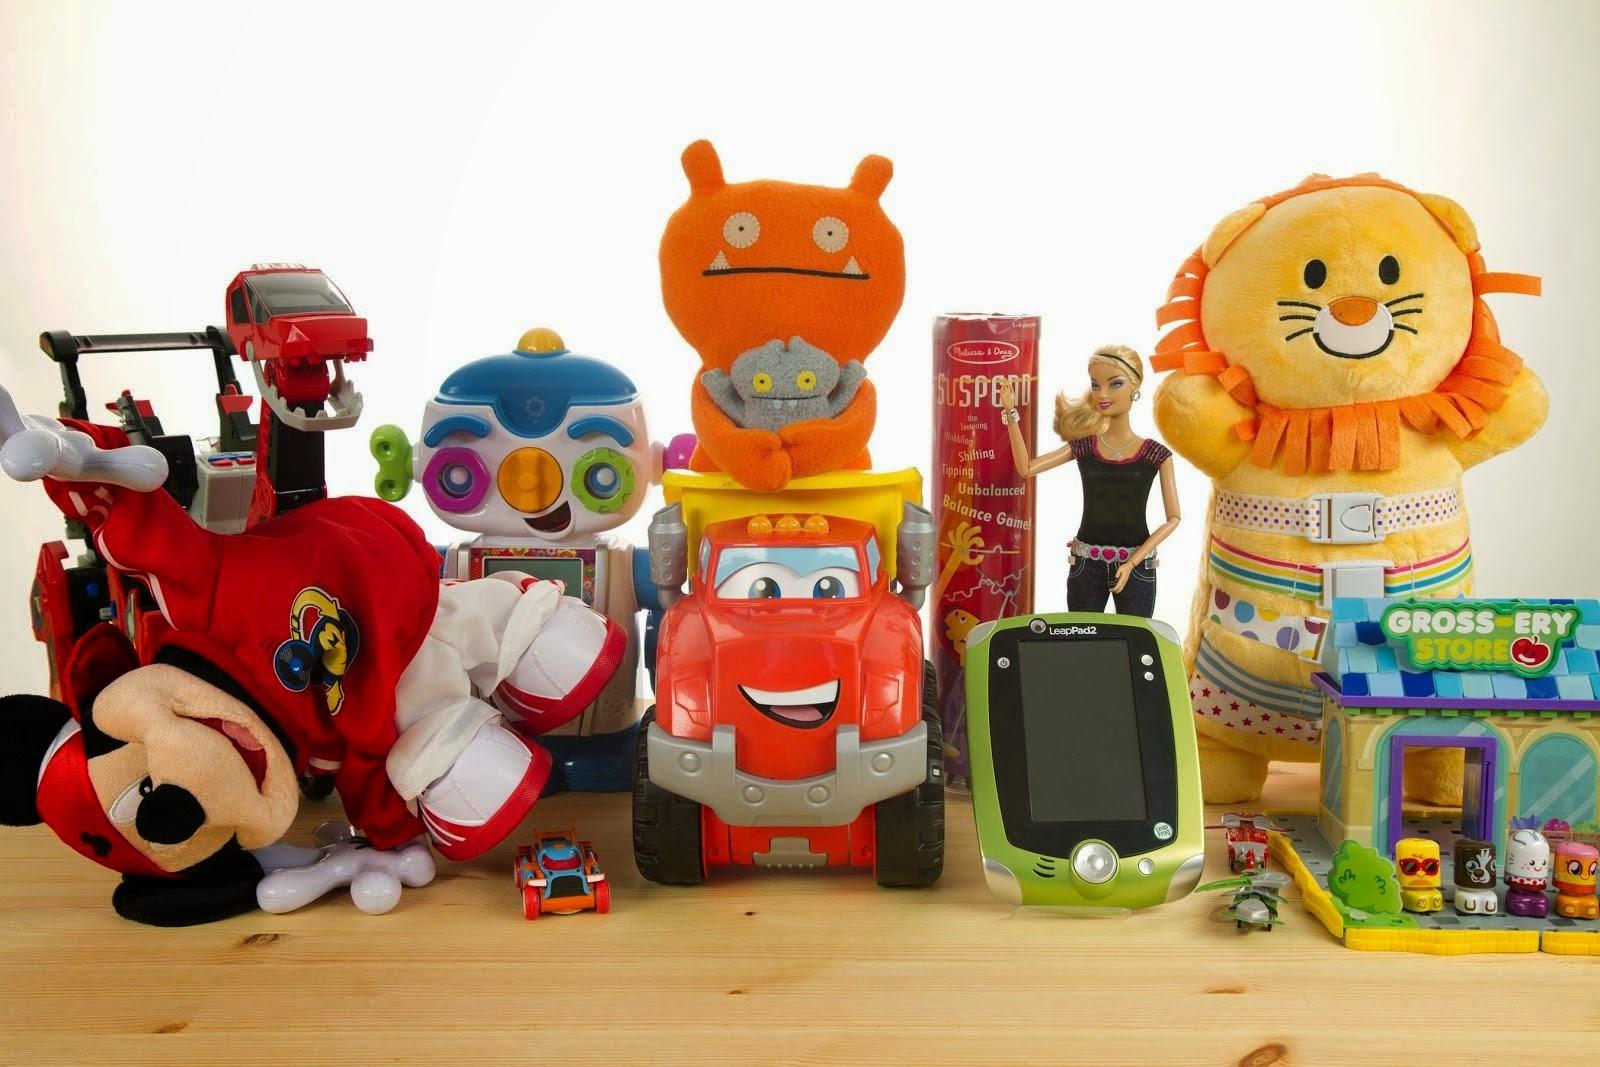 25 Best Kids Toys HD Wallpapers | Explore Wallpaper